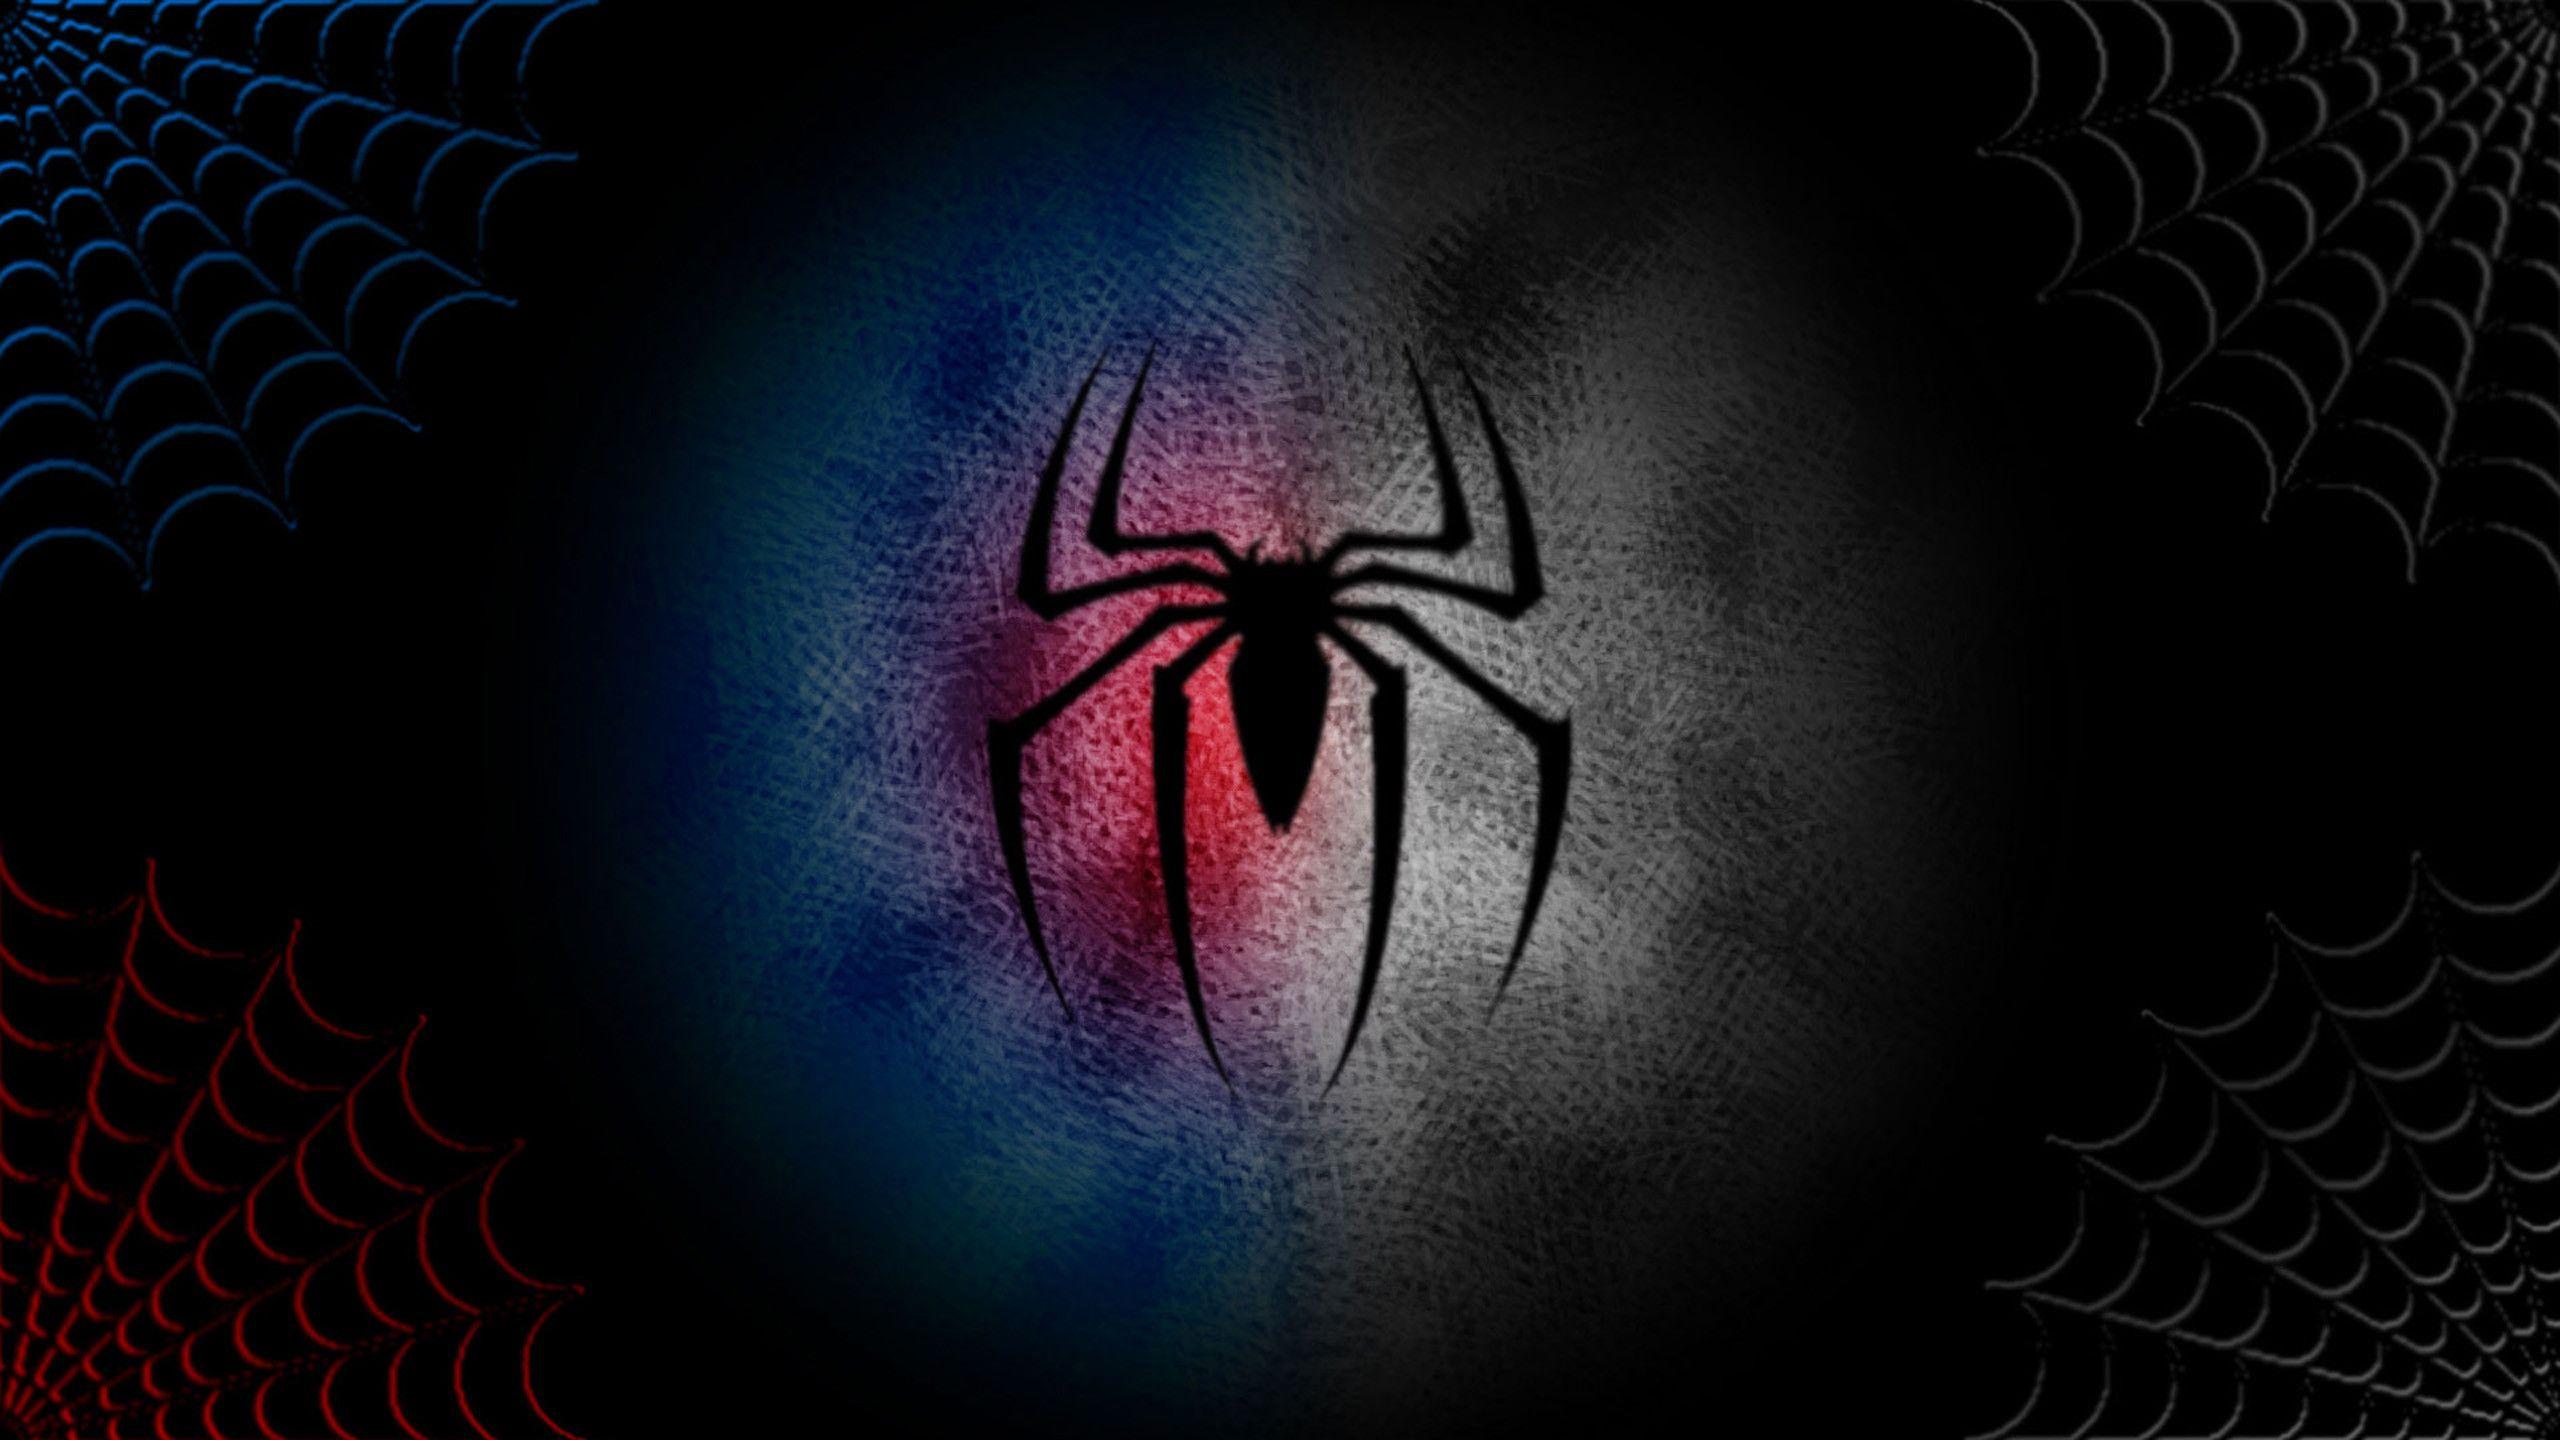 2560x1440 Spiderman logo wallpaper, HD Desktop Wallpapers